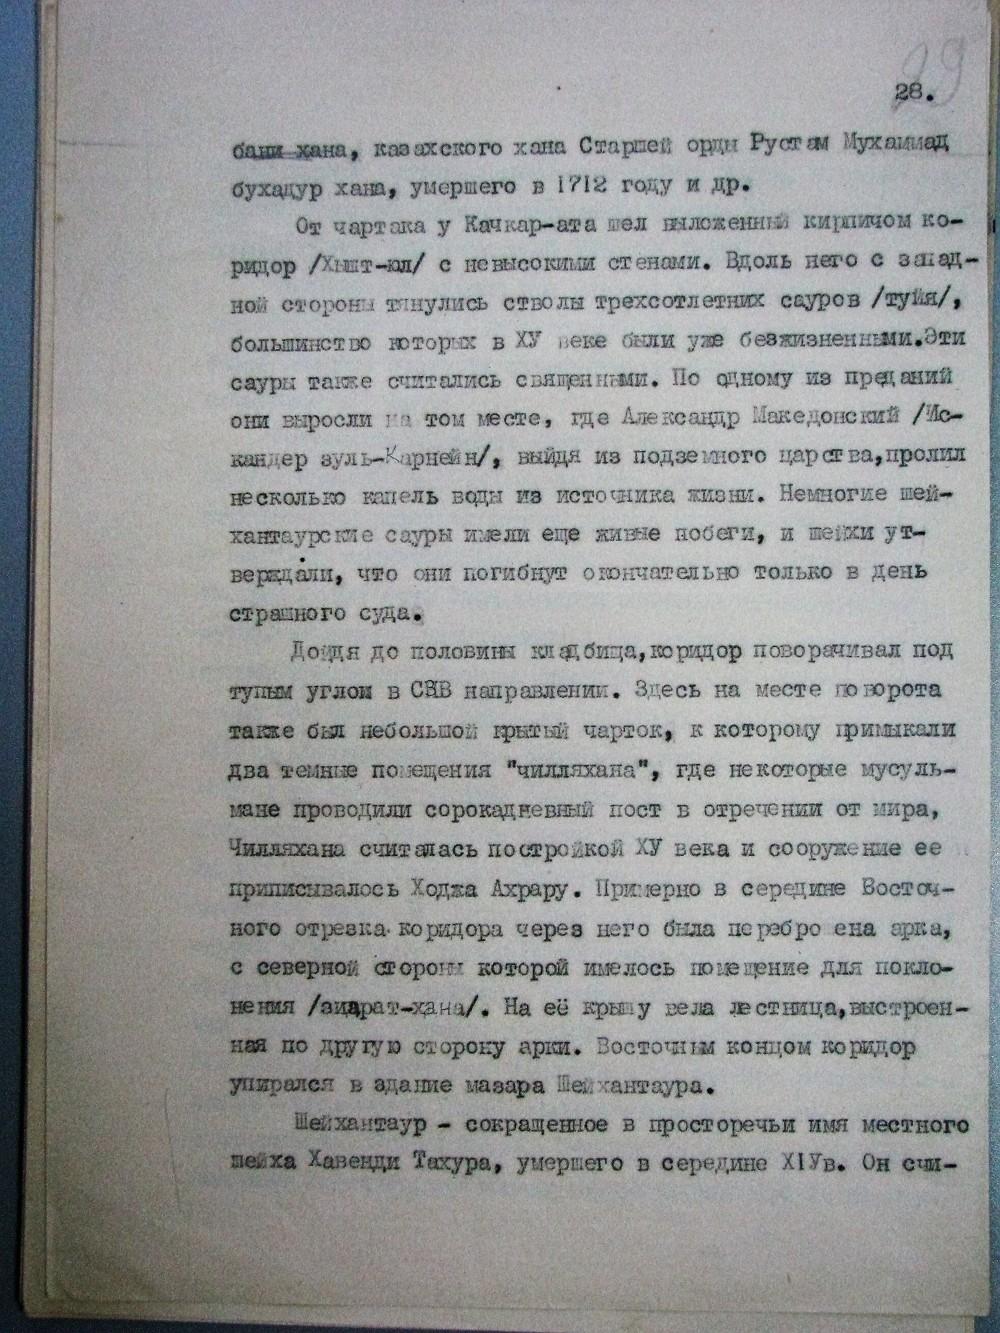 Ташкент, Массон (27)